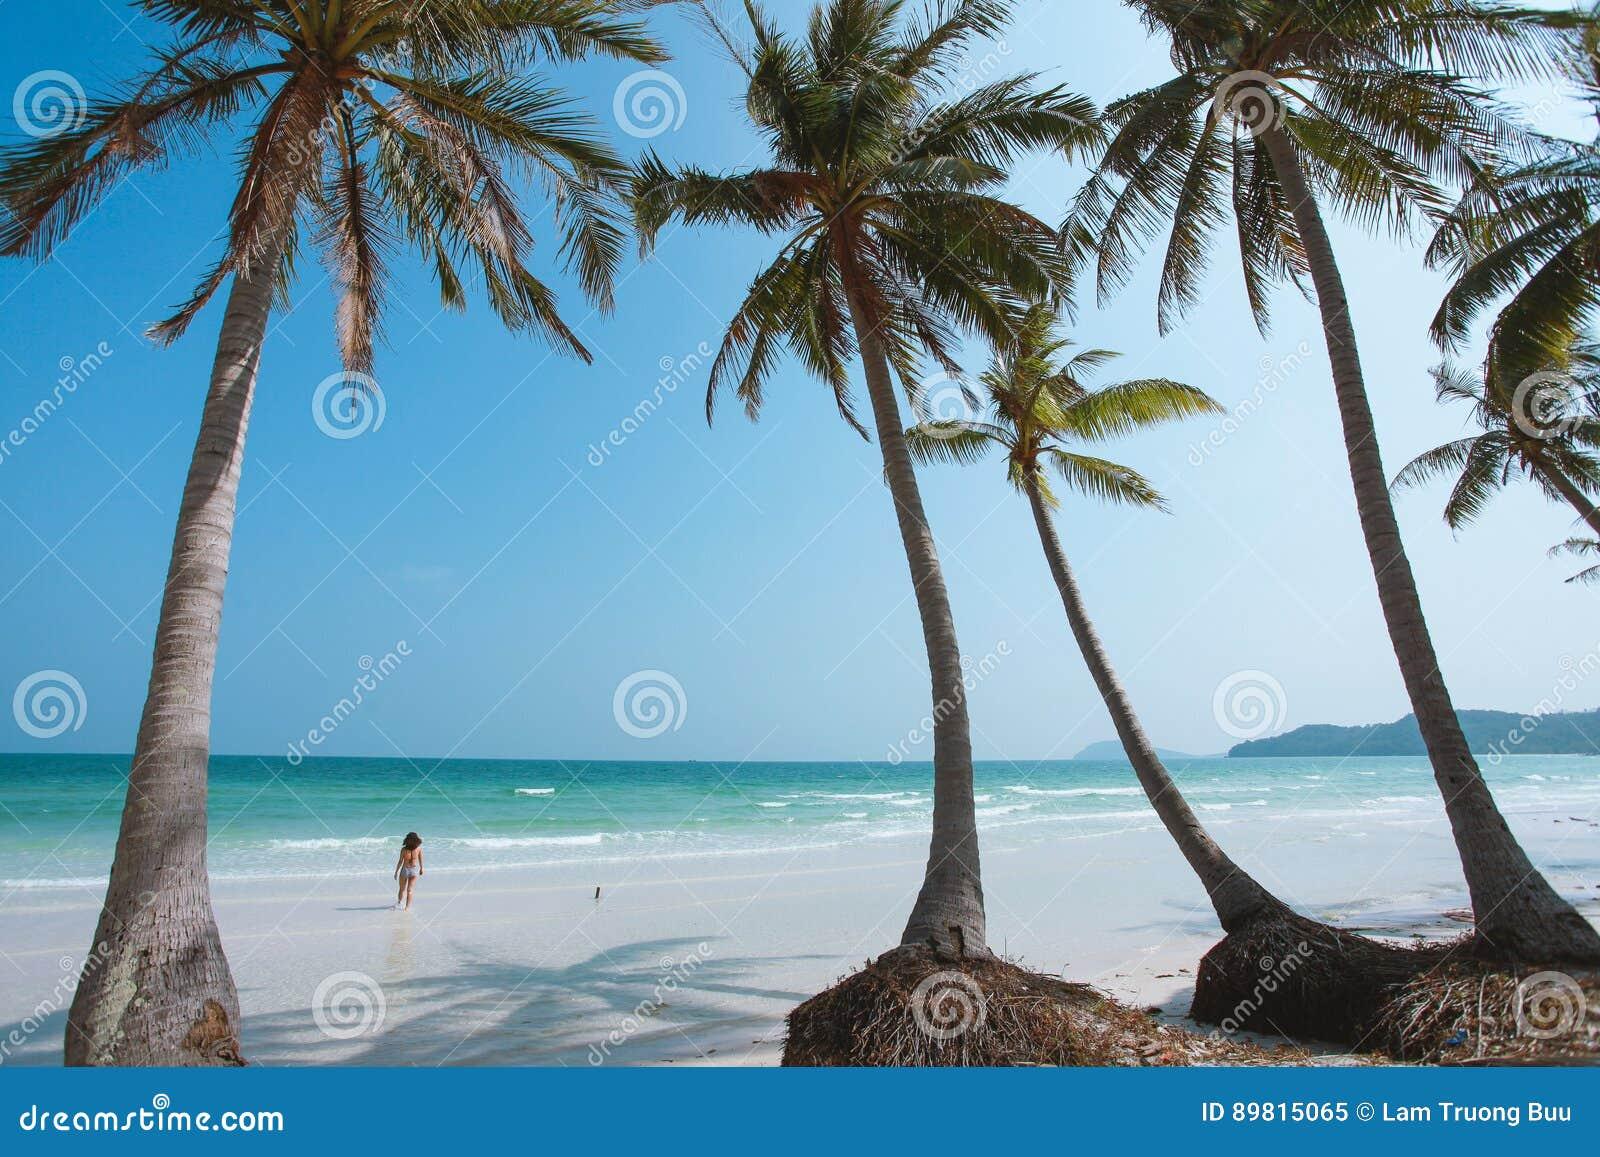 Пляжи фото фукуок вьетнам